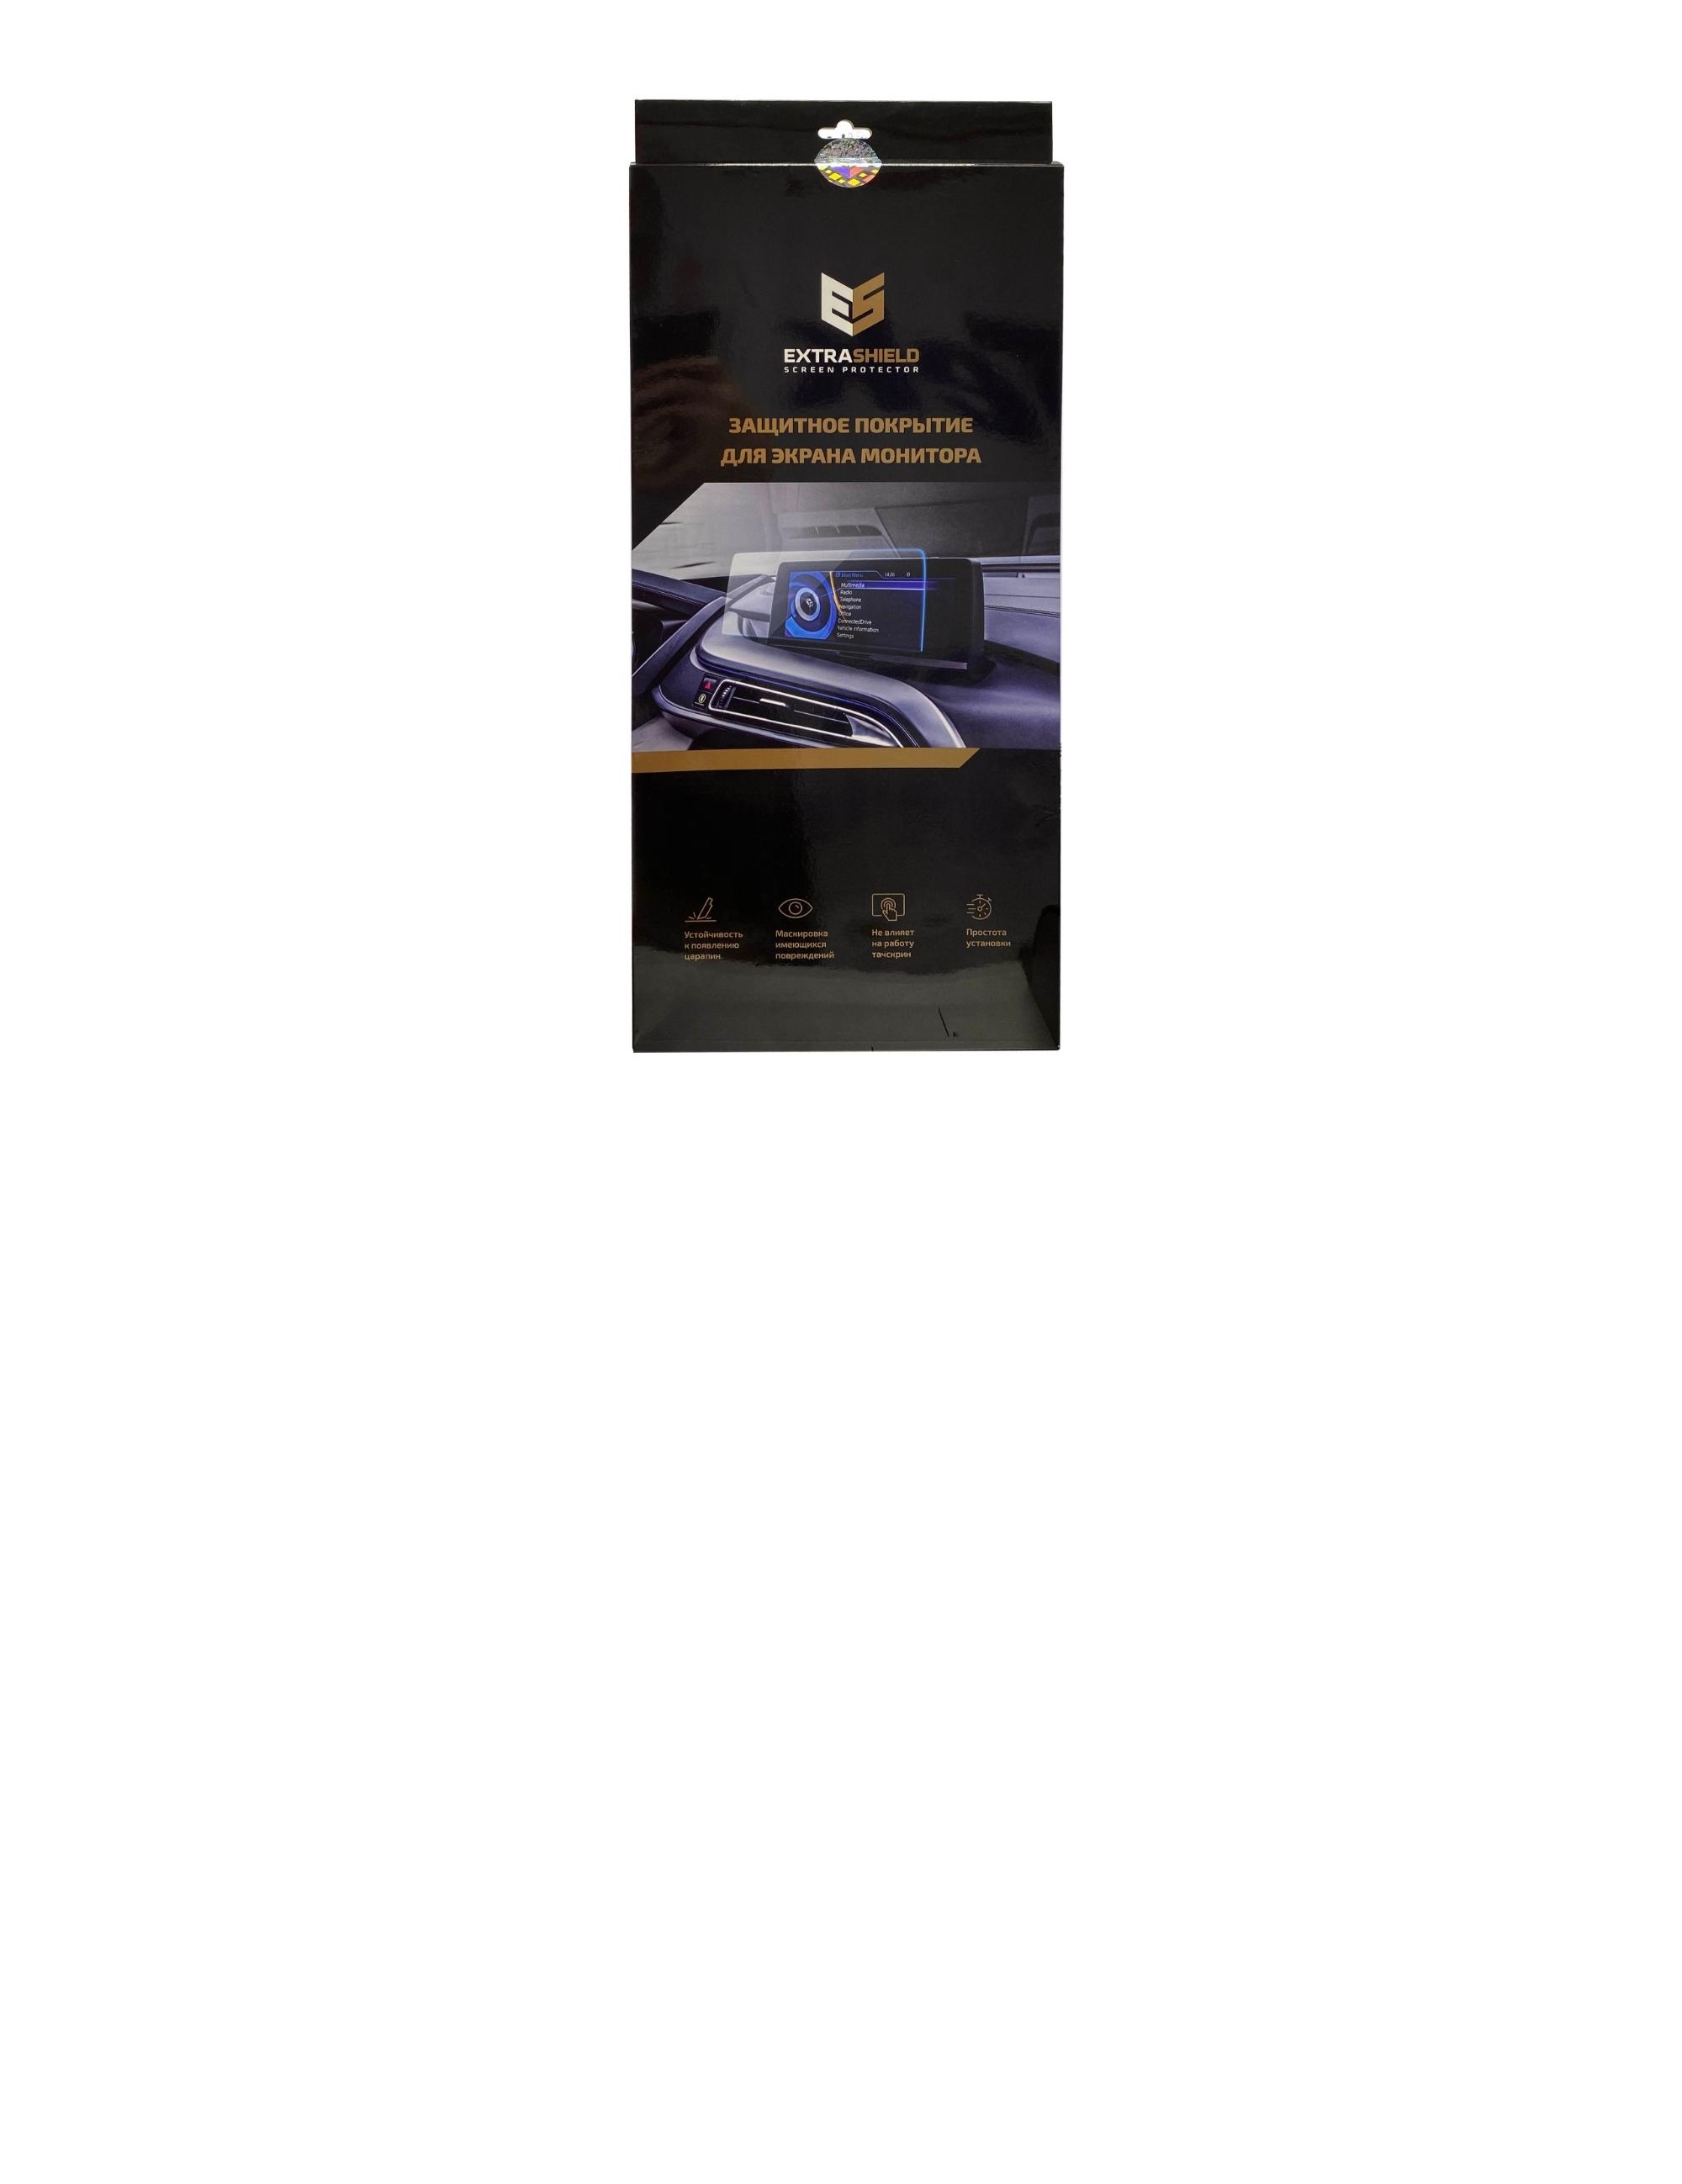 BMW 5 серия  (F10/ F11/ F07) 2013 - 2017 мультимедиа NBT 8,8 Статическая пленка Глянец